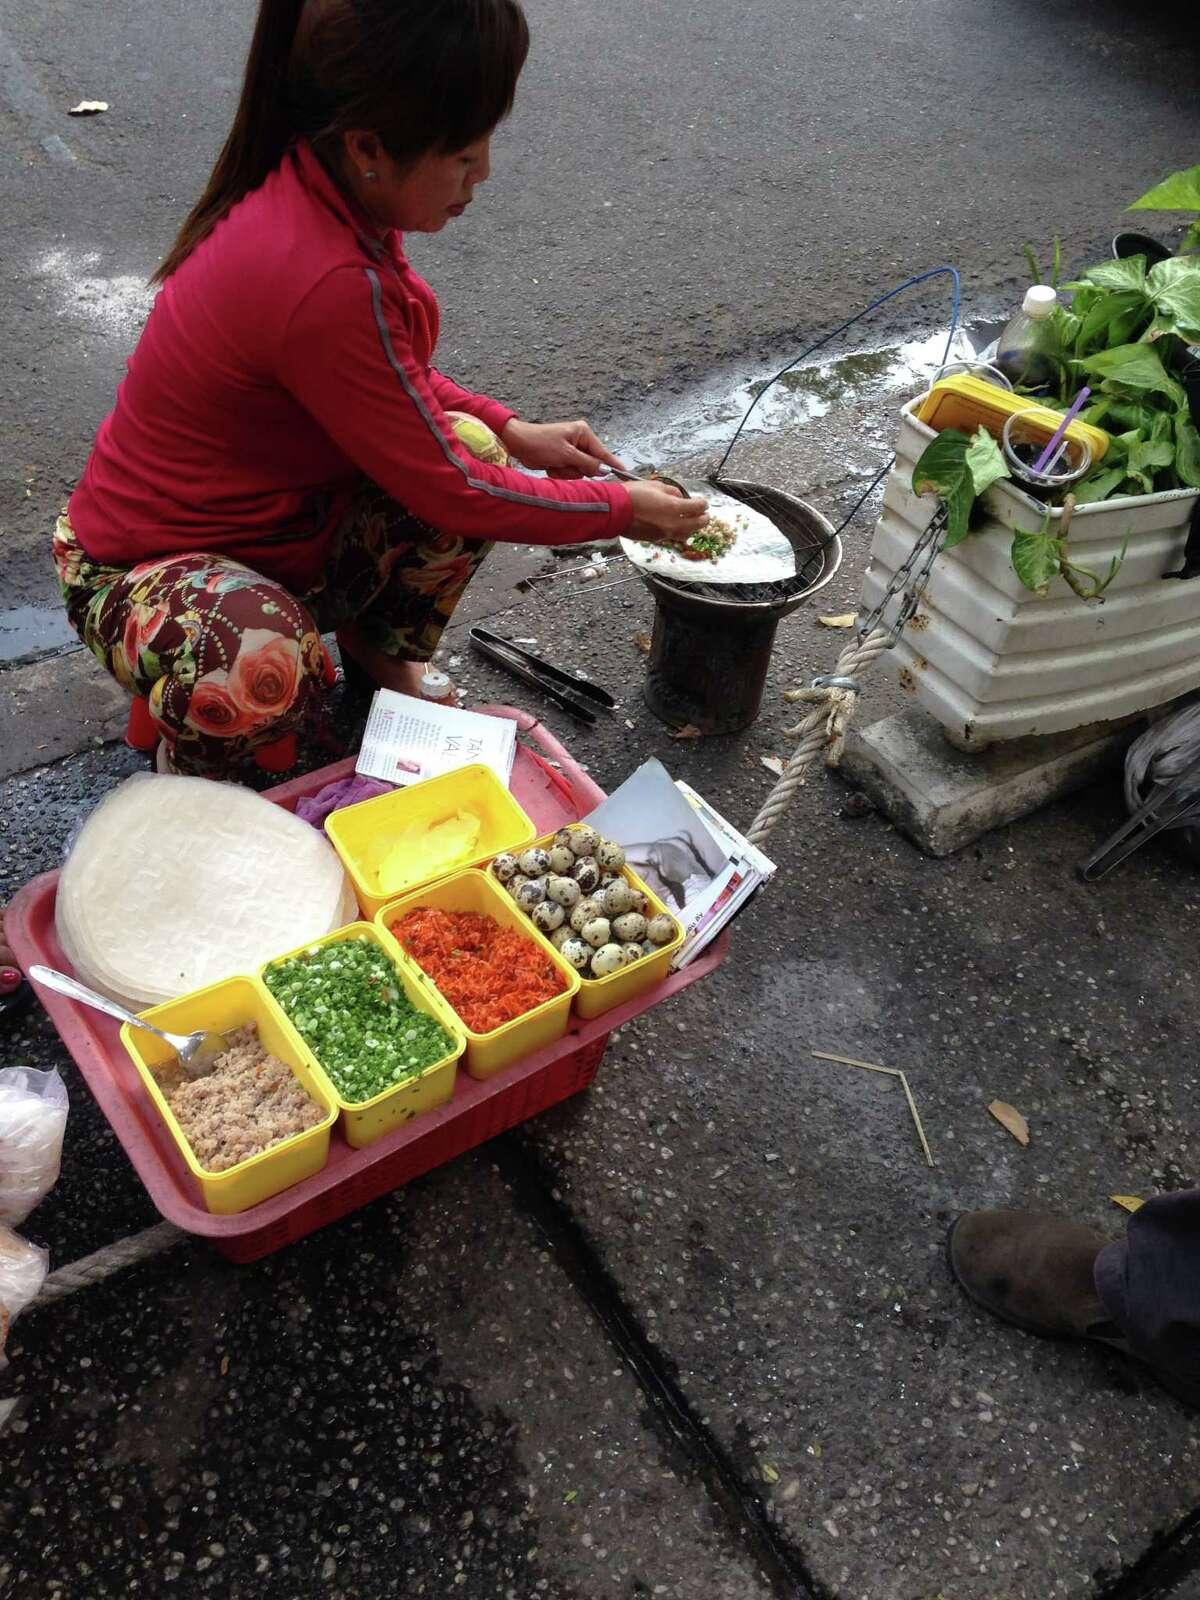 A street food vendor in Ho Chi Minh City, Vietnam